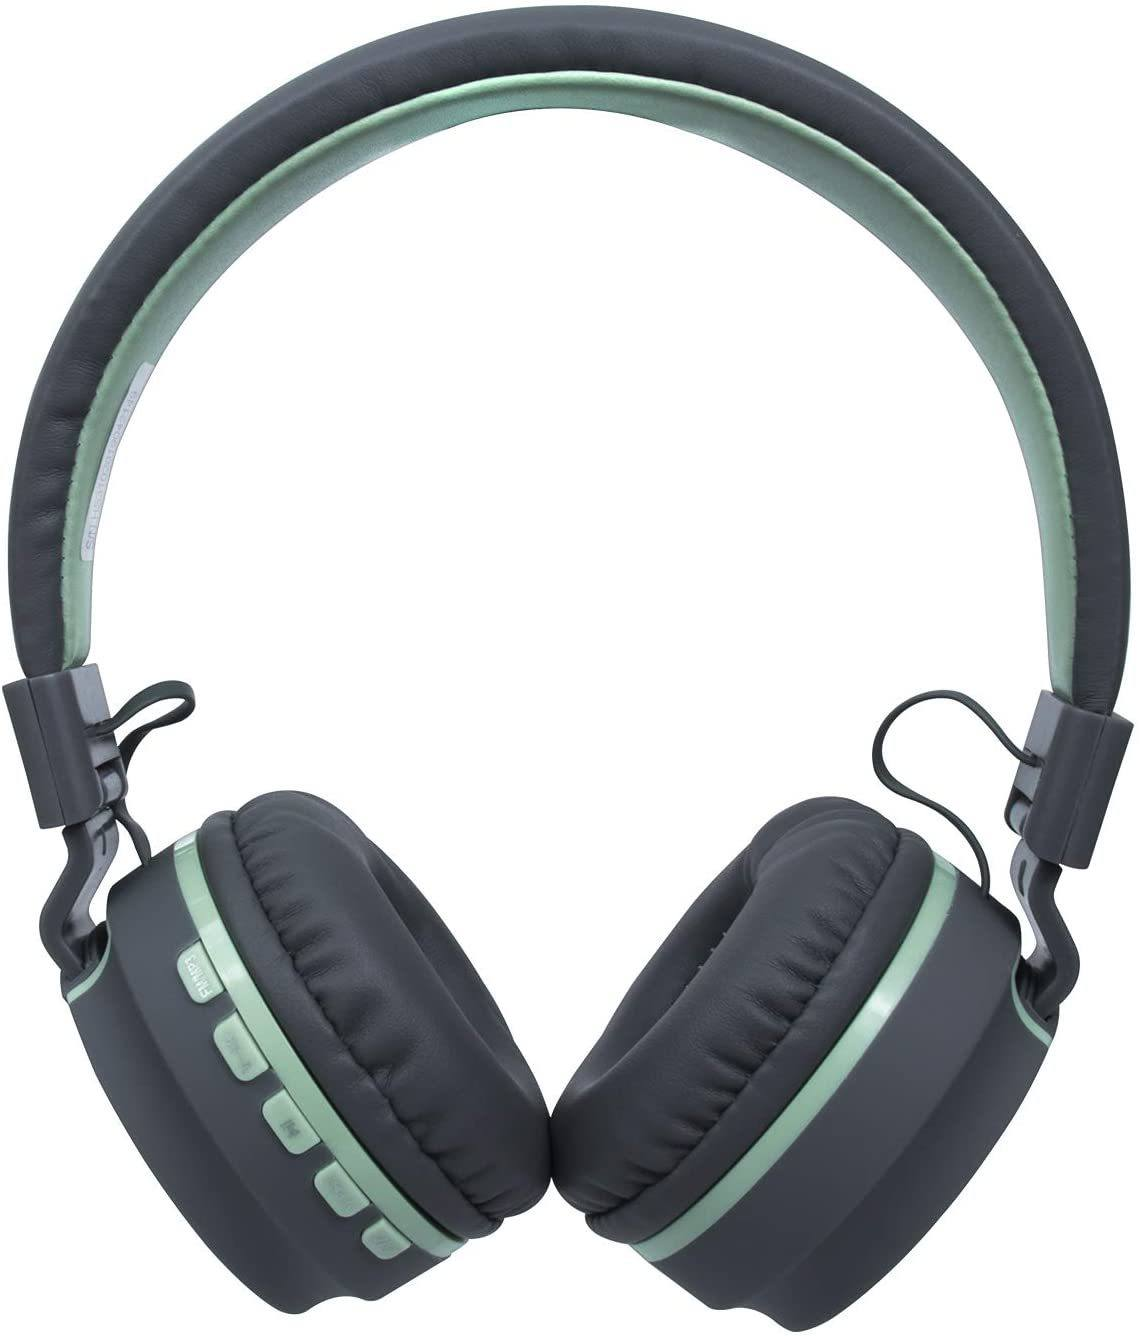 Headset OEX Candy Cinza Com Verde Claro HS310